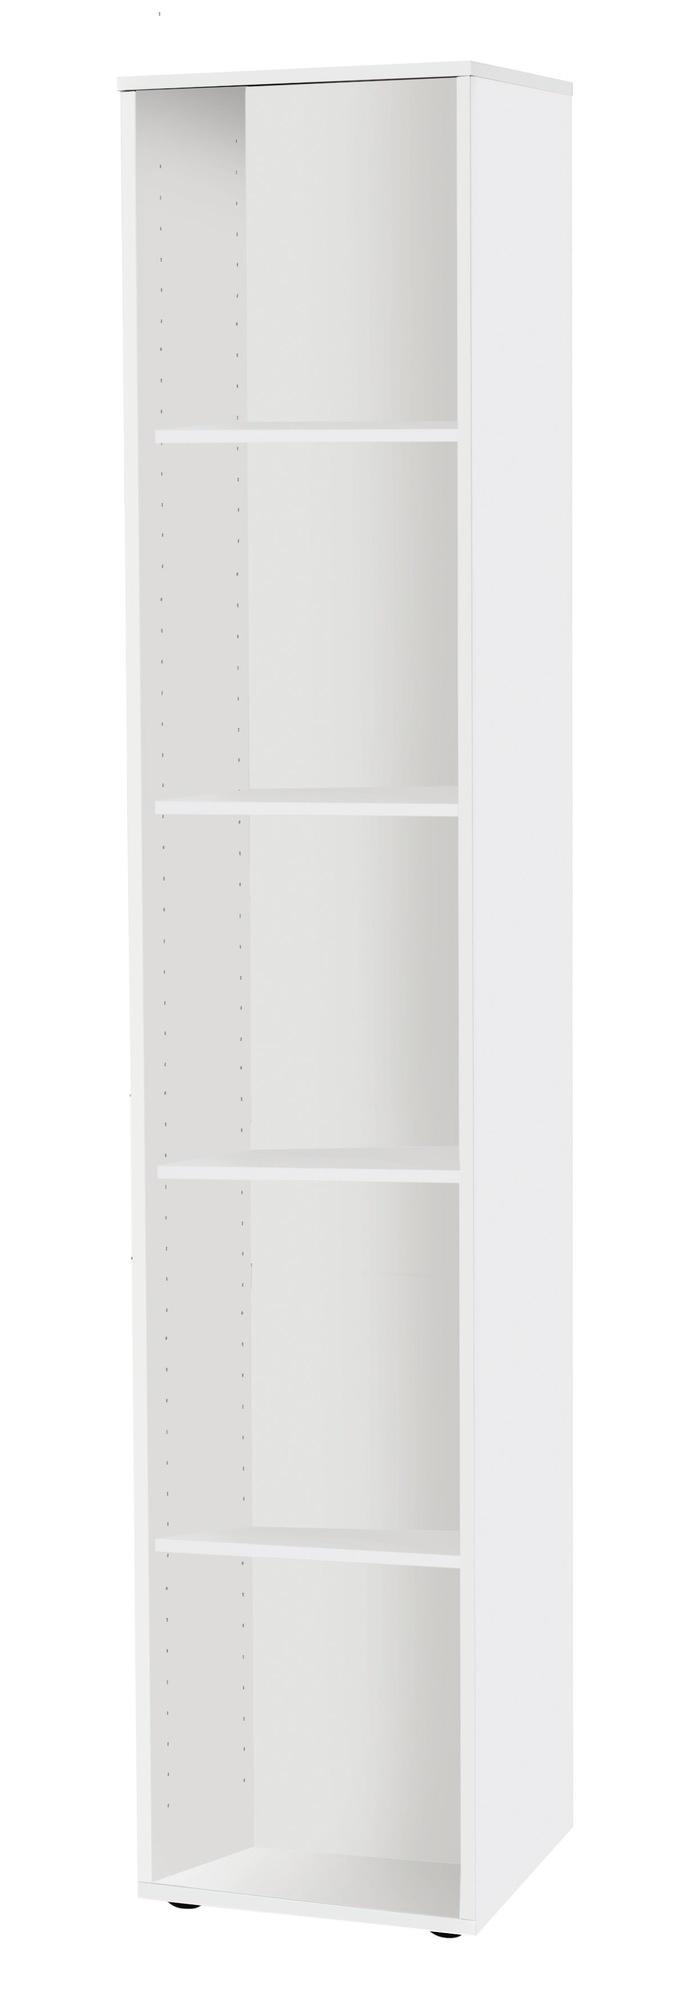 1547717413-buero-35x180cm-regal-lodge.jpg